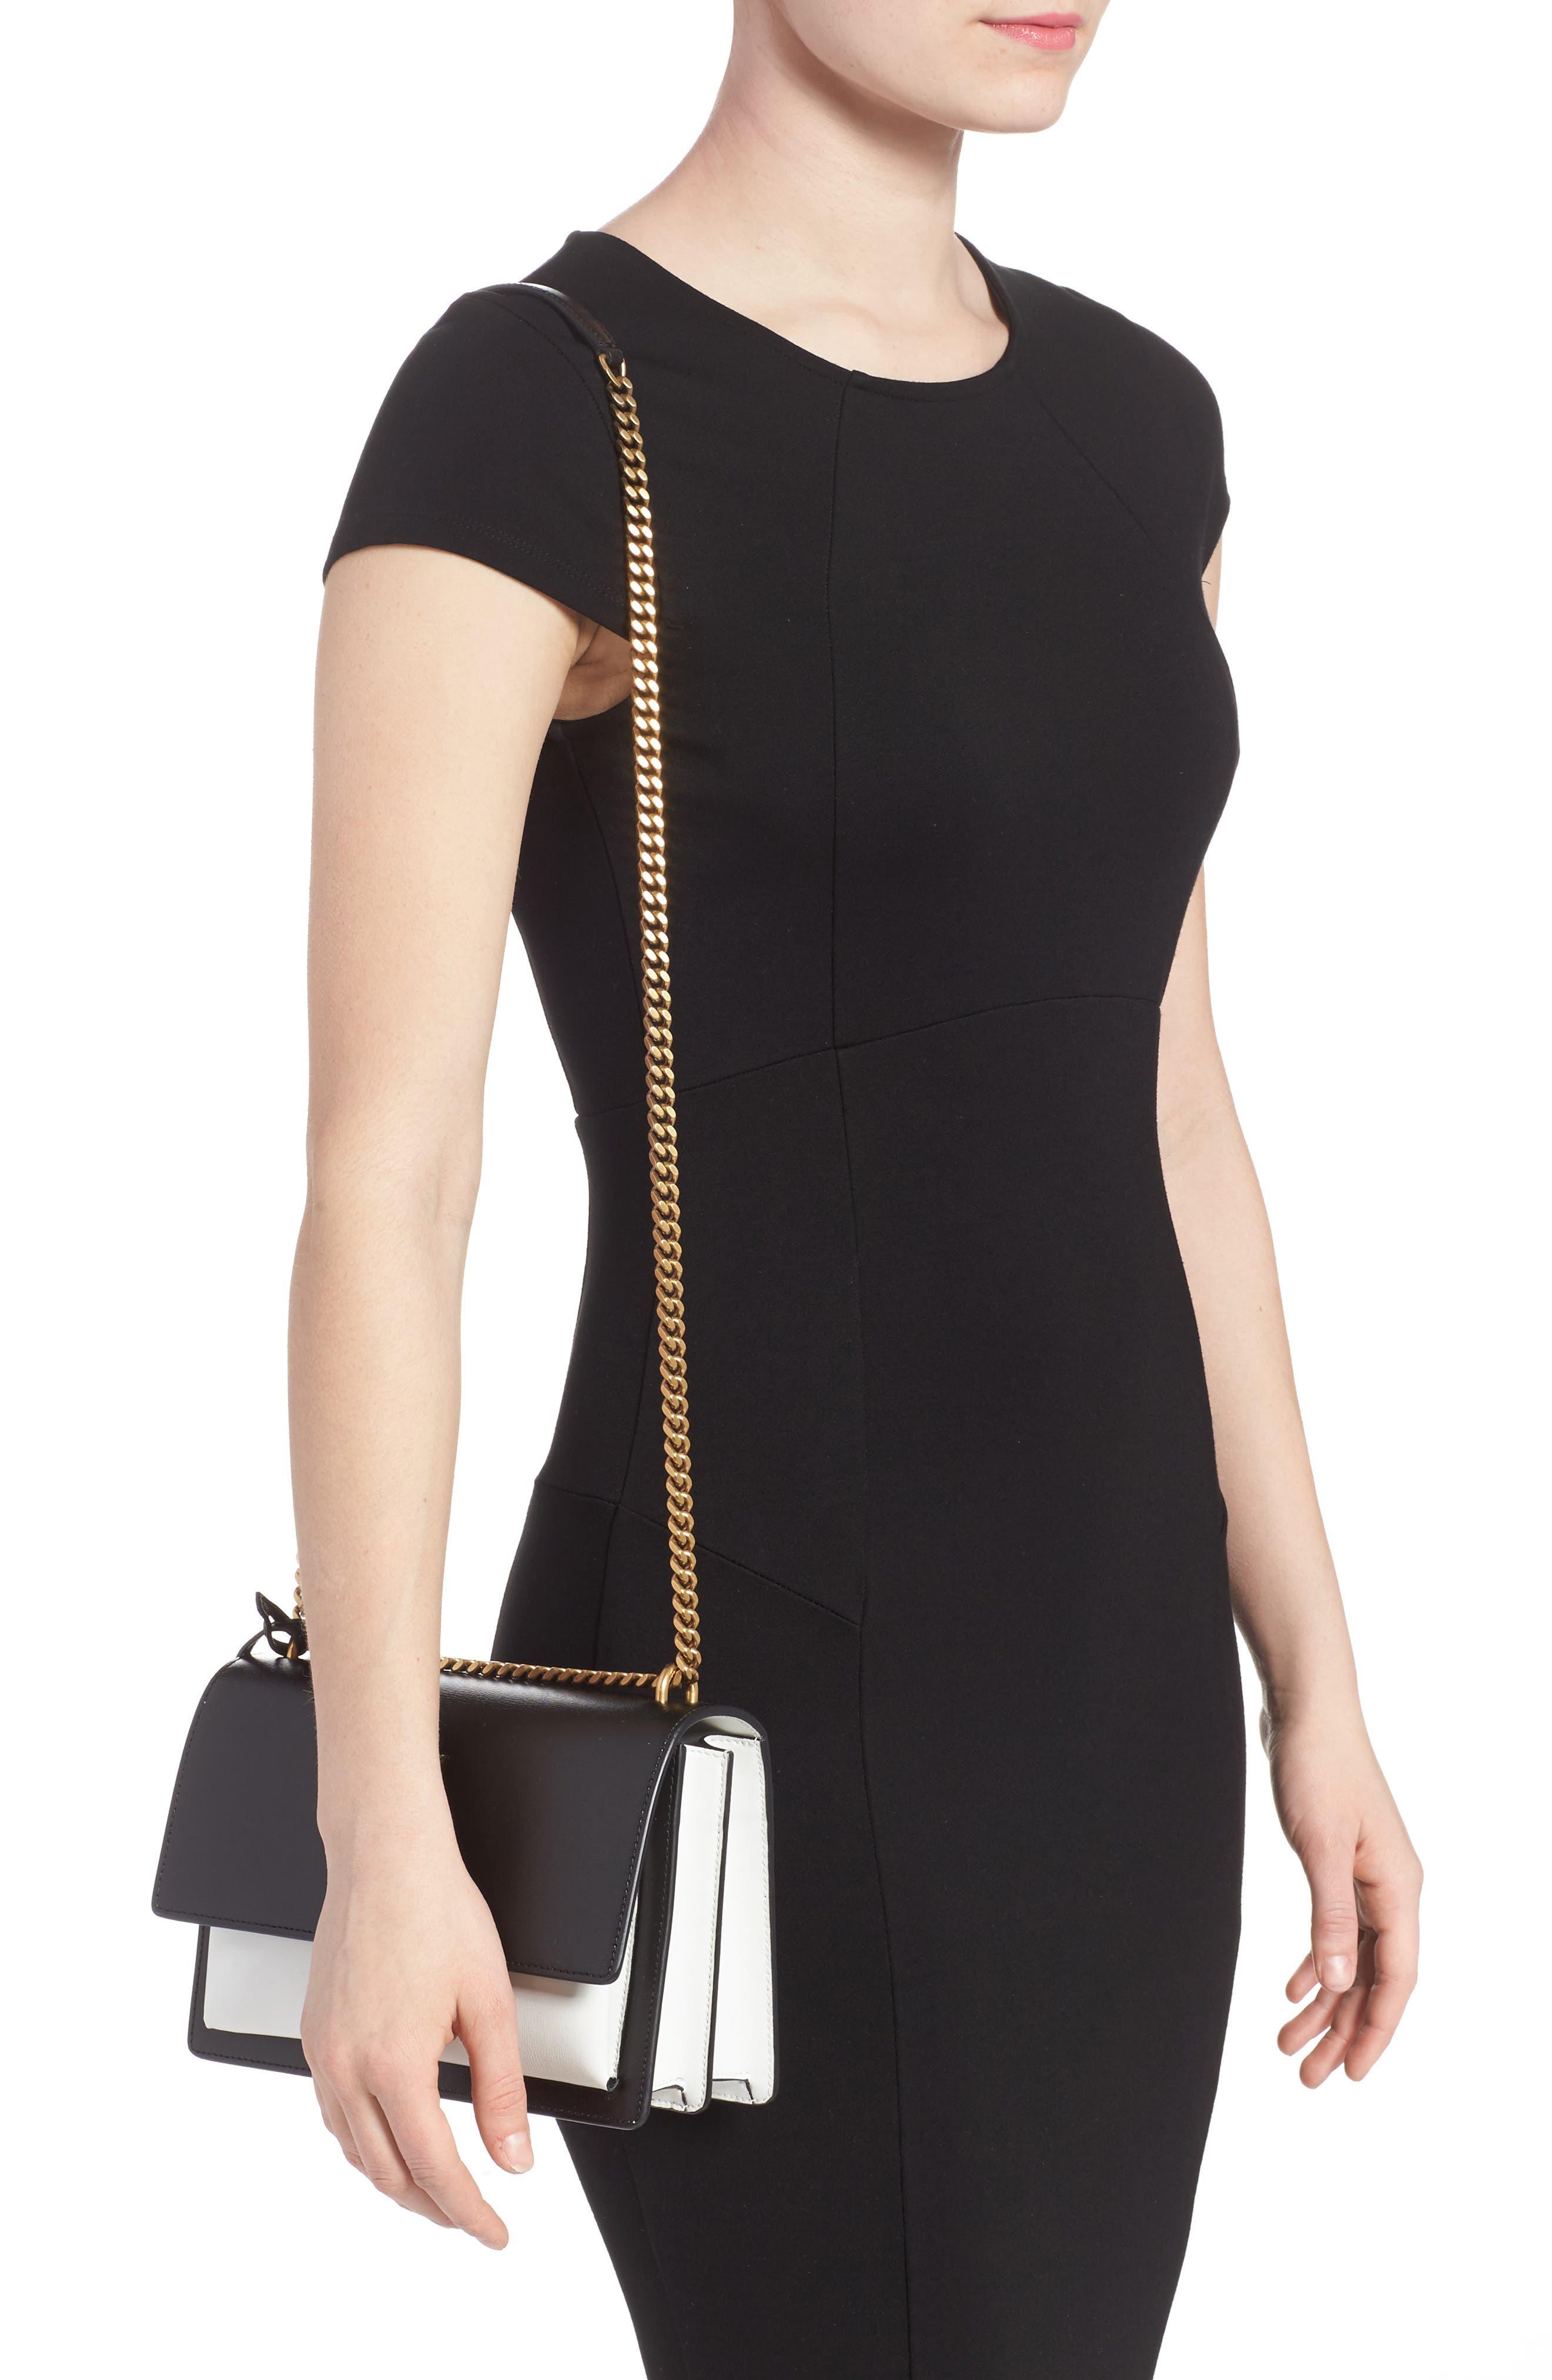 Medium Sunset Leather Shoulder Bag,                             Alternate thumbnail 2, color,                             Black/ White